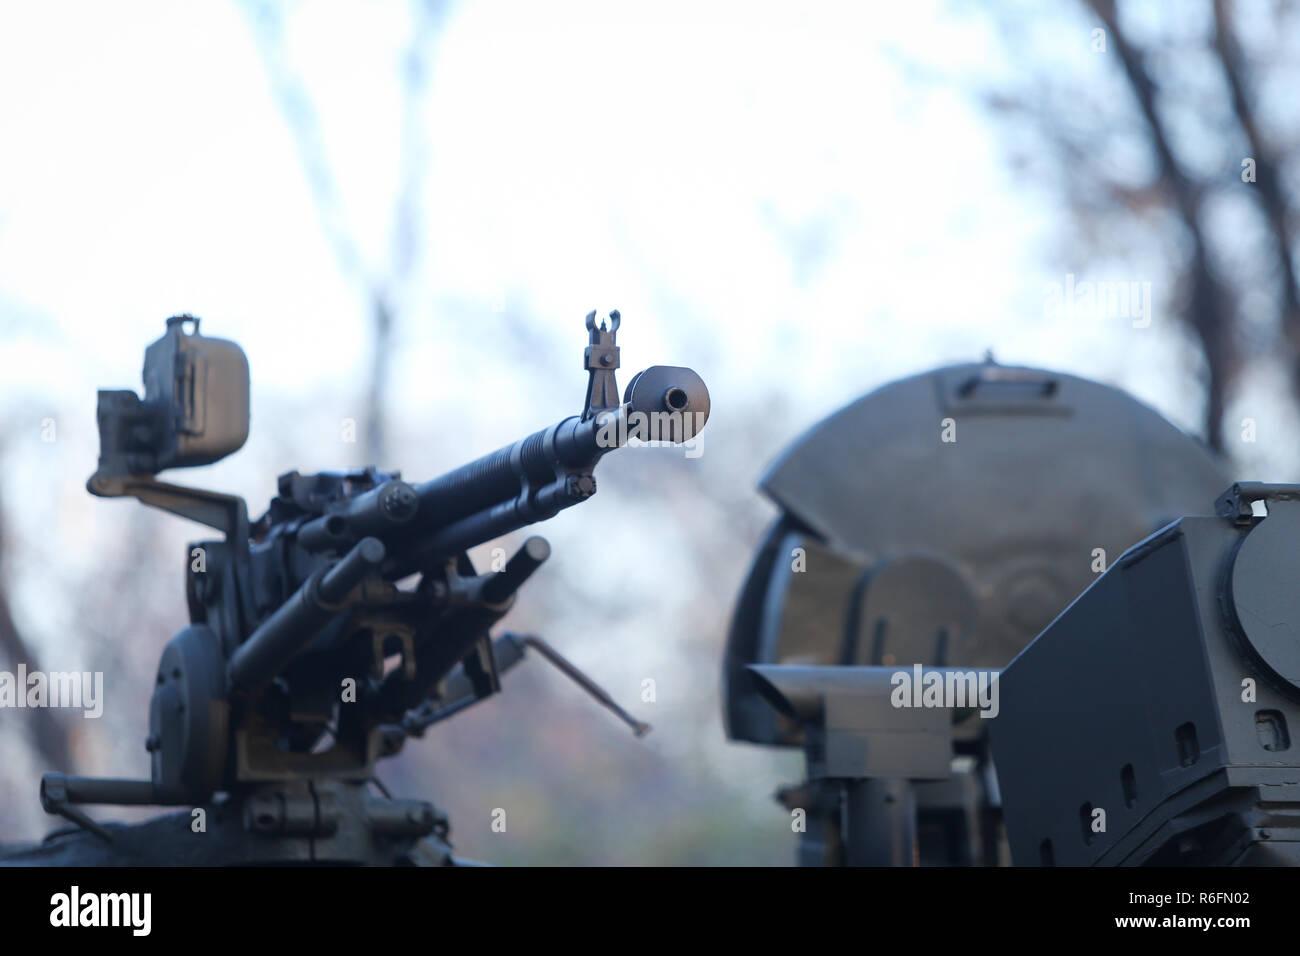 BUCHAREST, ROMANIA - December 1, 2018: 50 cal machine gun mounted on a Humvee military vehicle - Stock Image